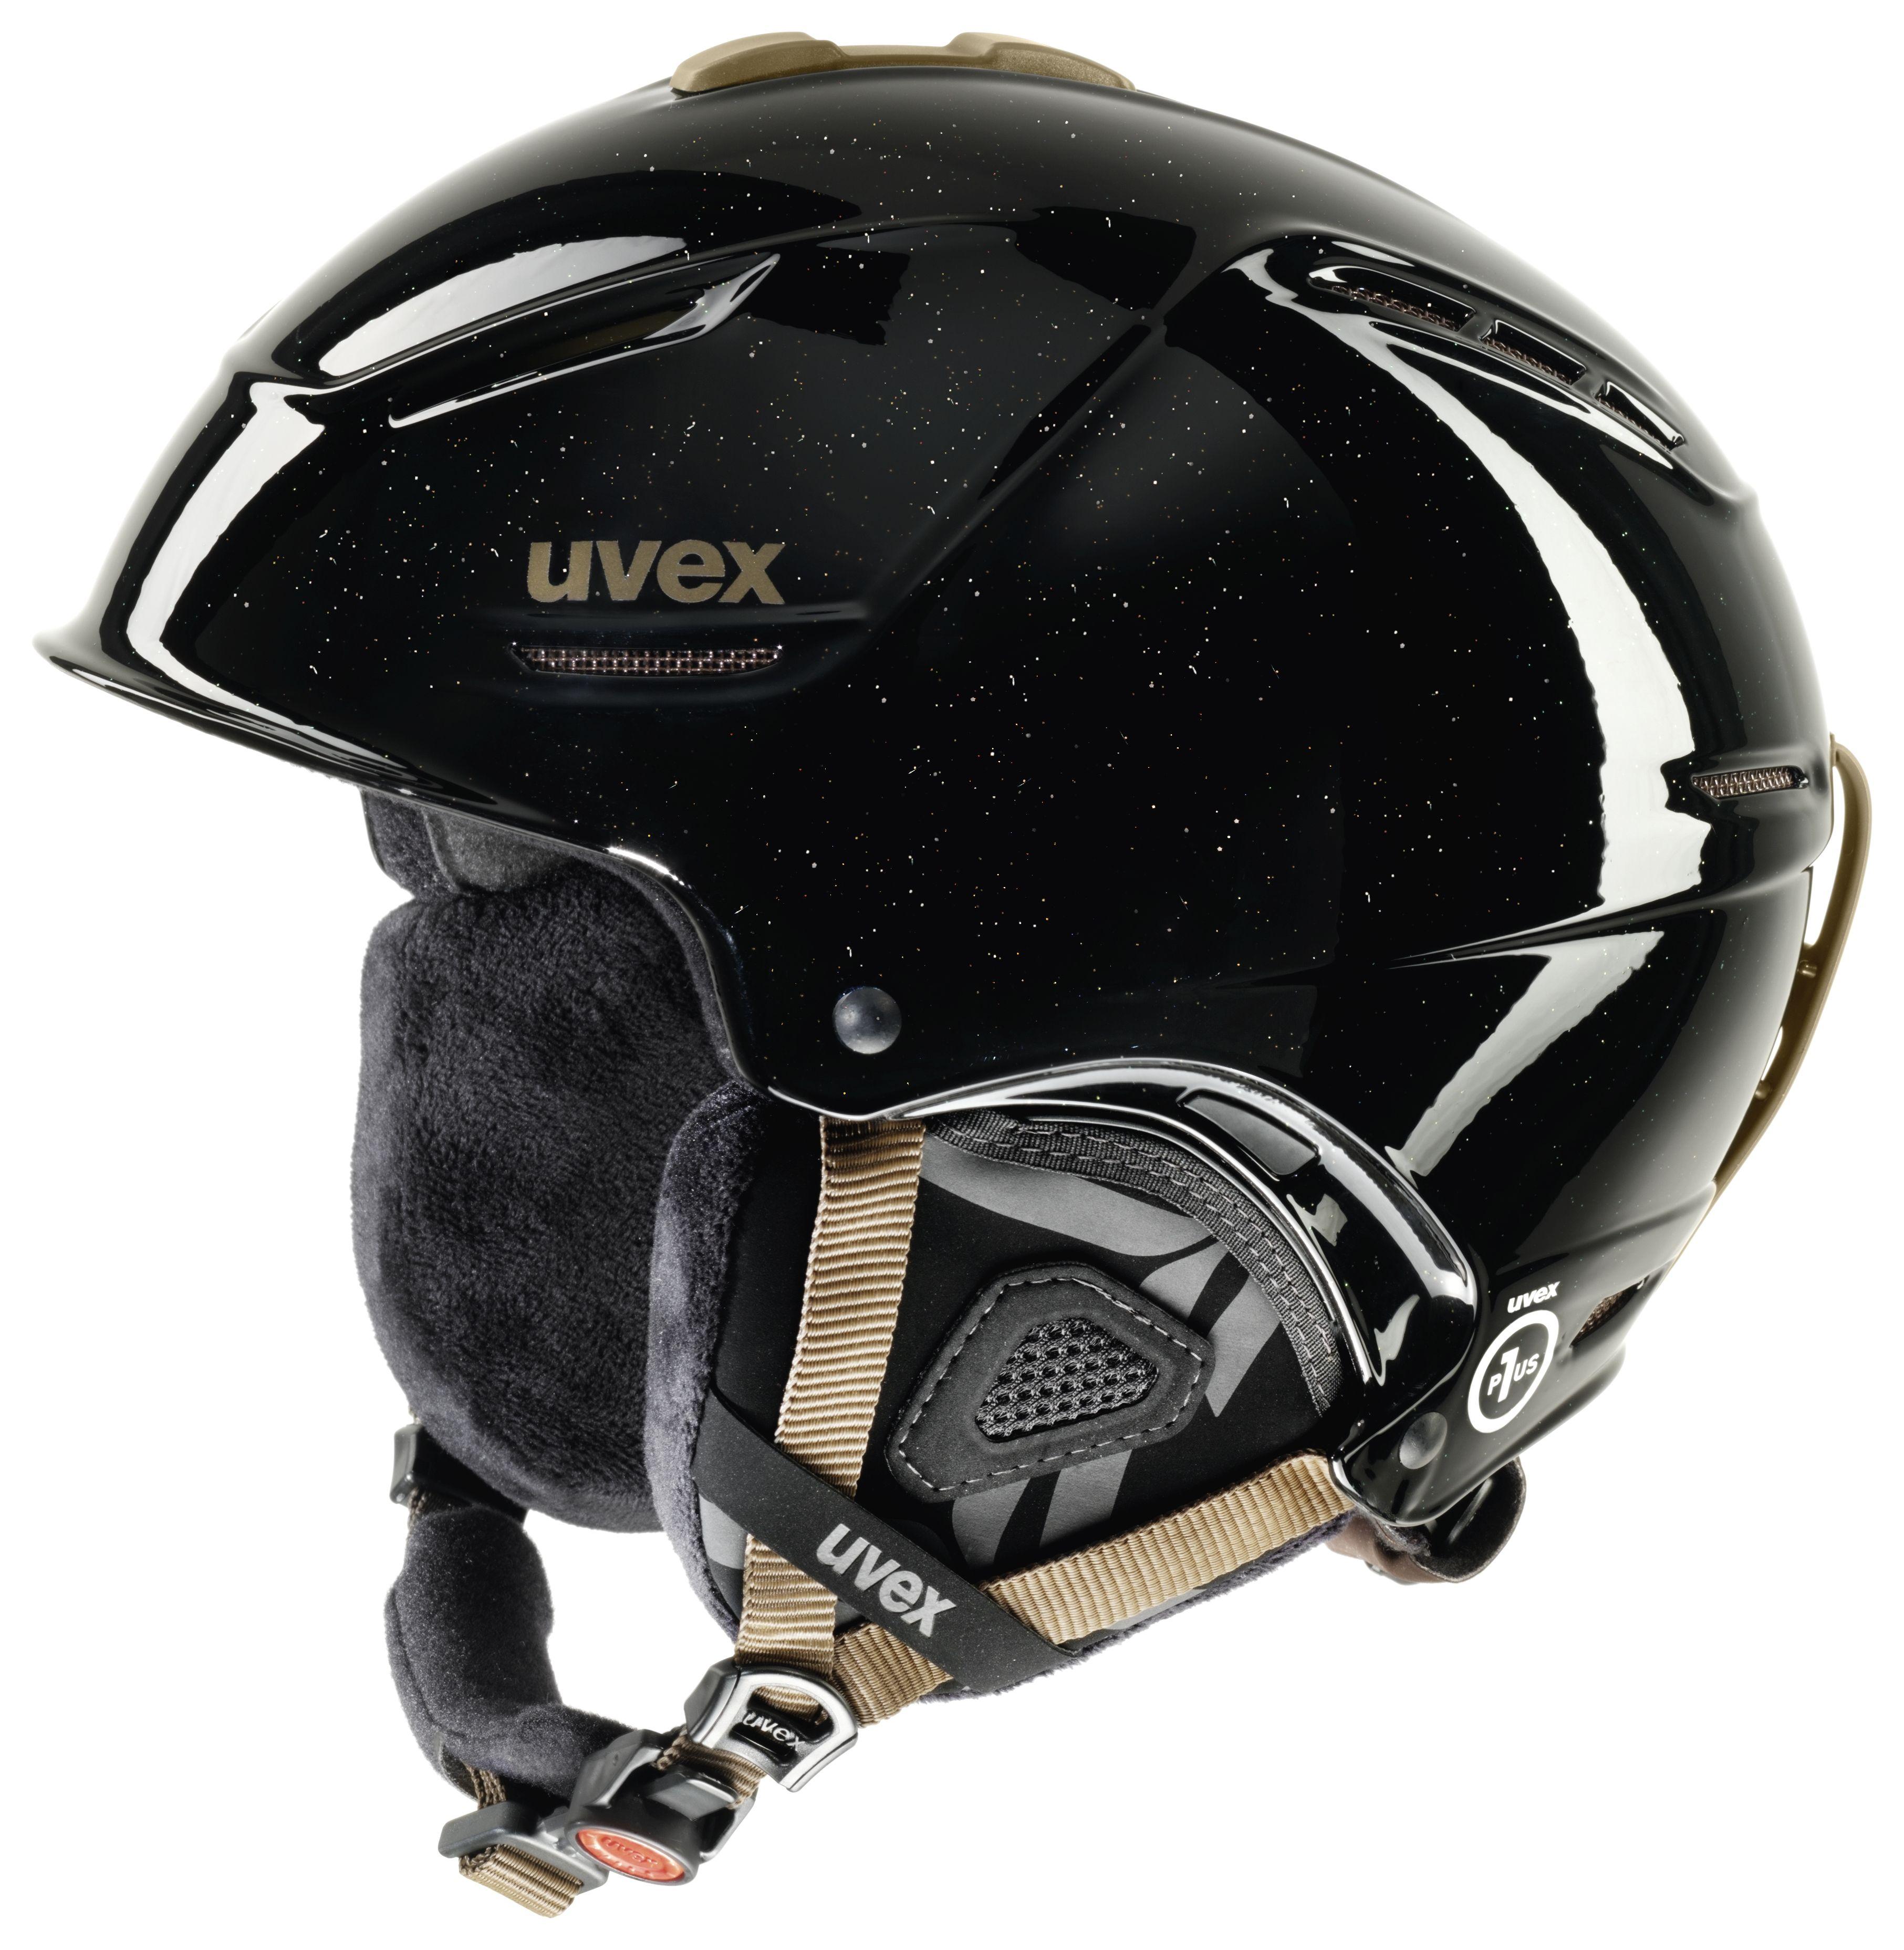 uvex p1us pro WL // It's a lady thing. The uvex p1us pro